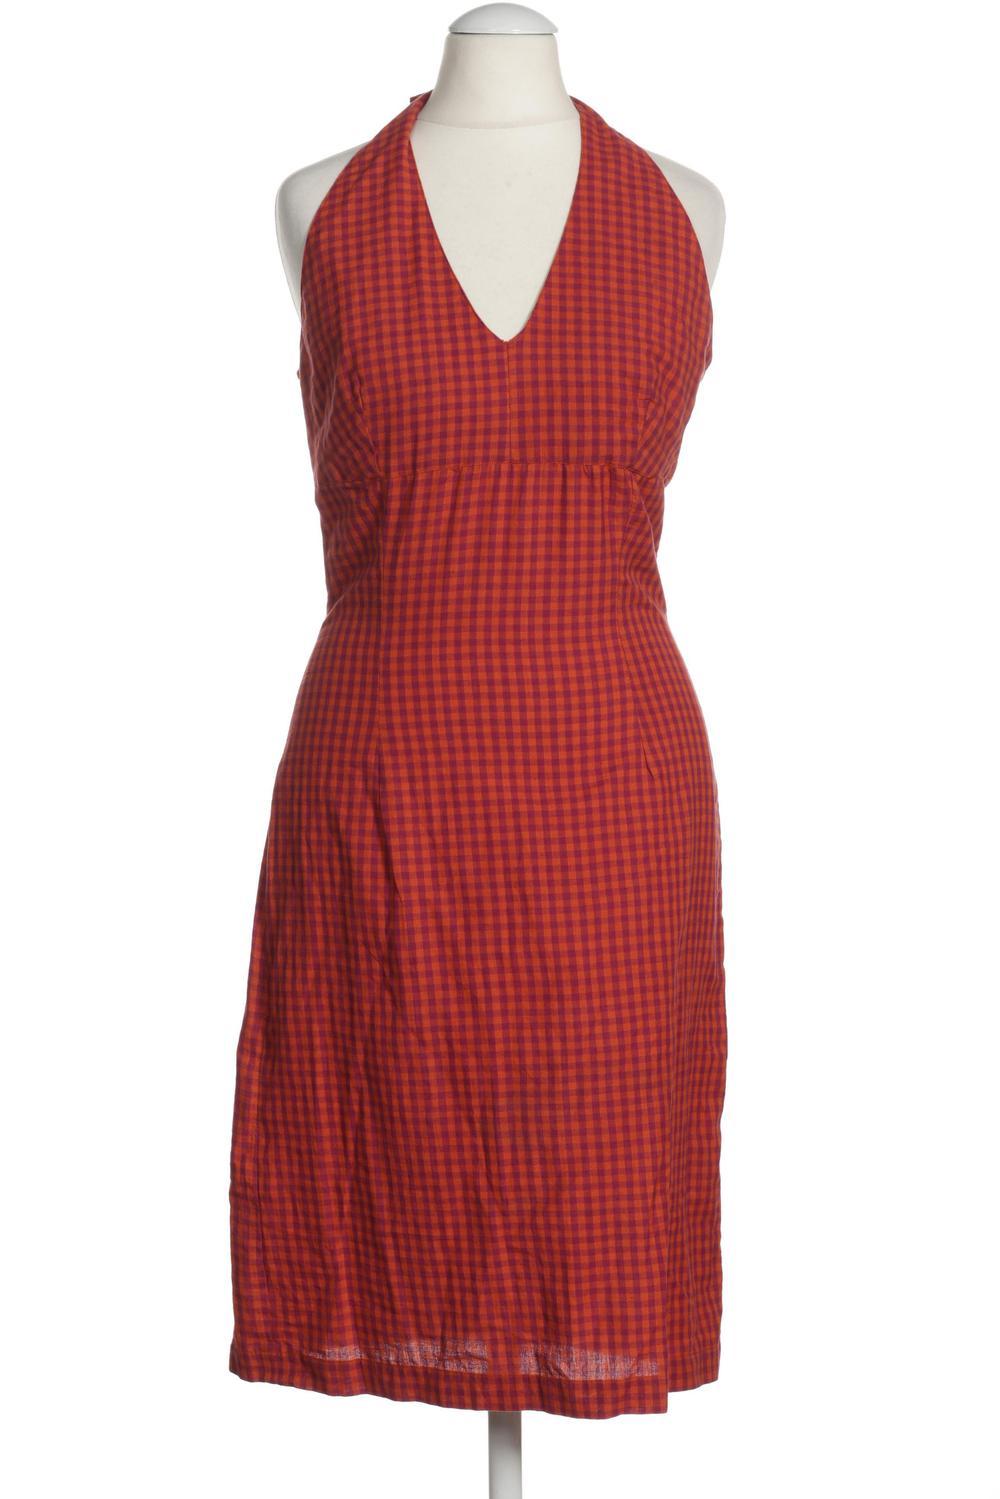 4ef562c1398f ubup | Monsoon Damen Kleid UK 8 Second Hand kaufen